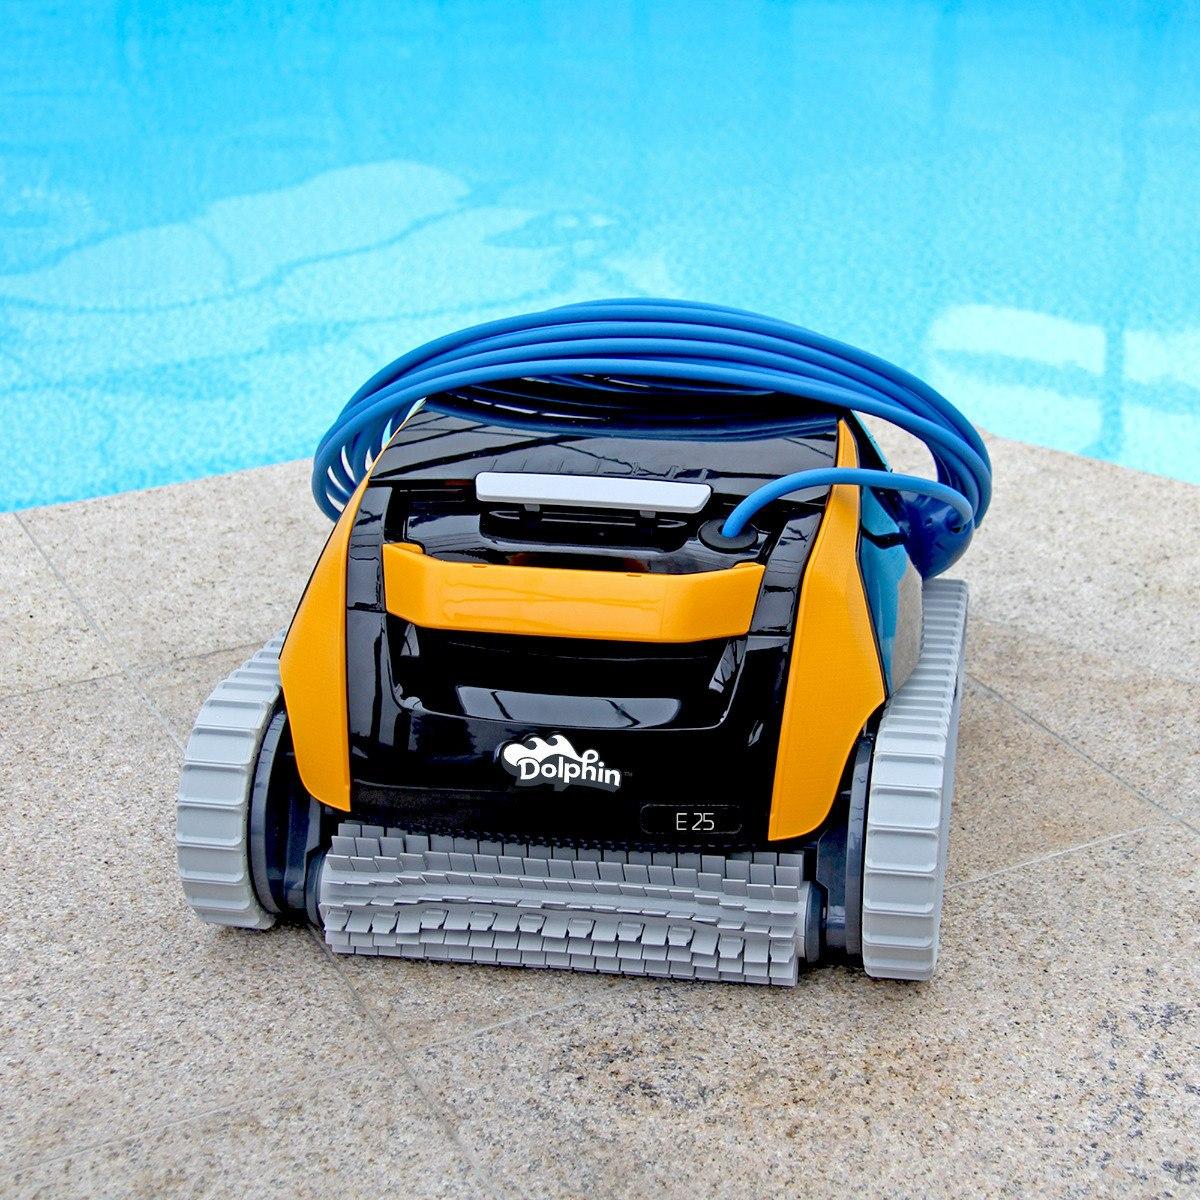 Pool robot Dolphin en jujuju aquacenter benissa